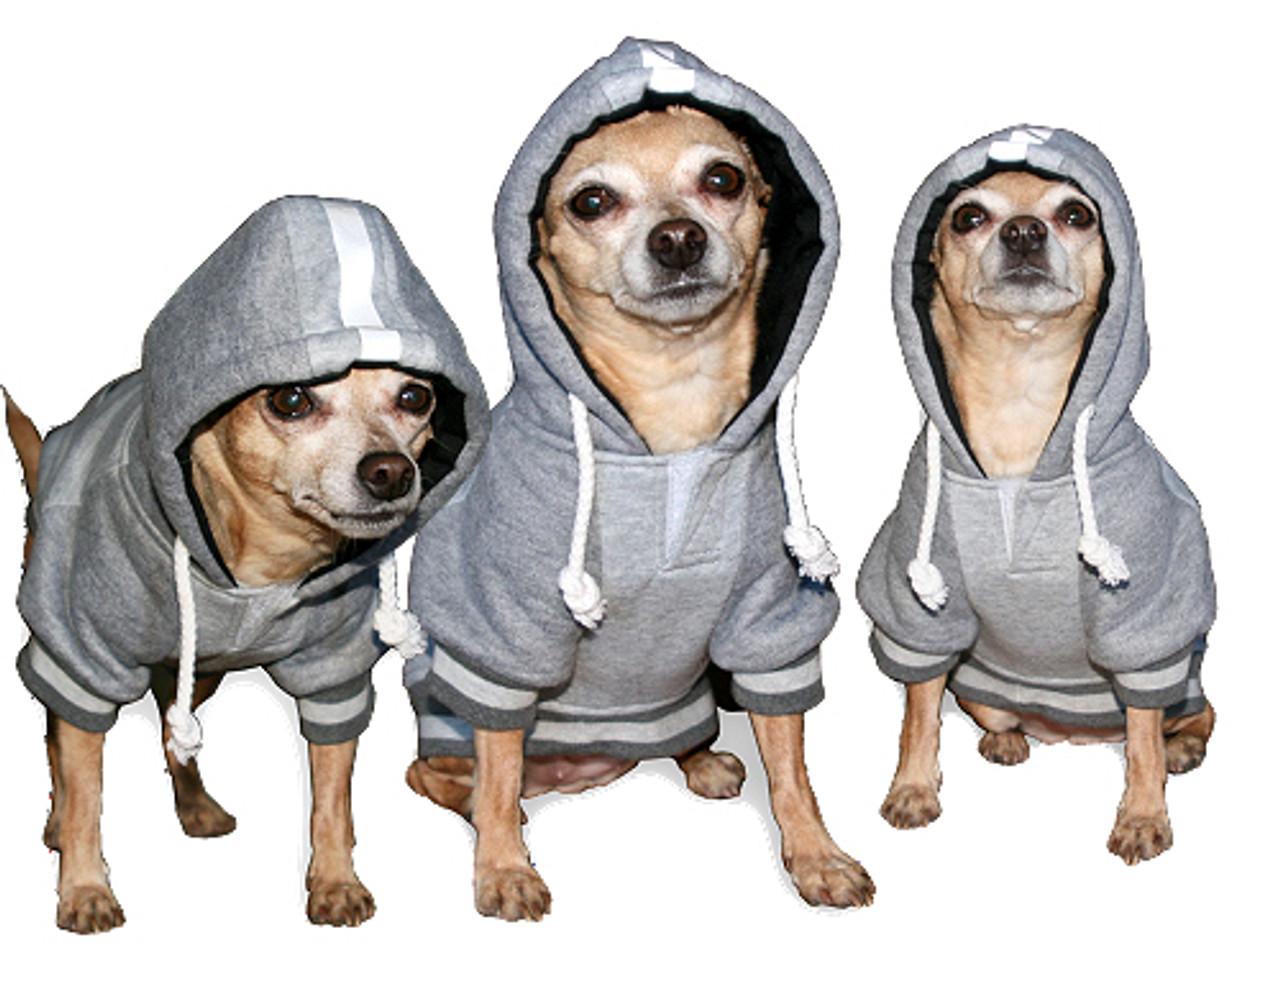 bill's dog jersey